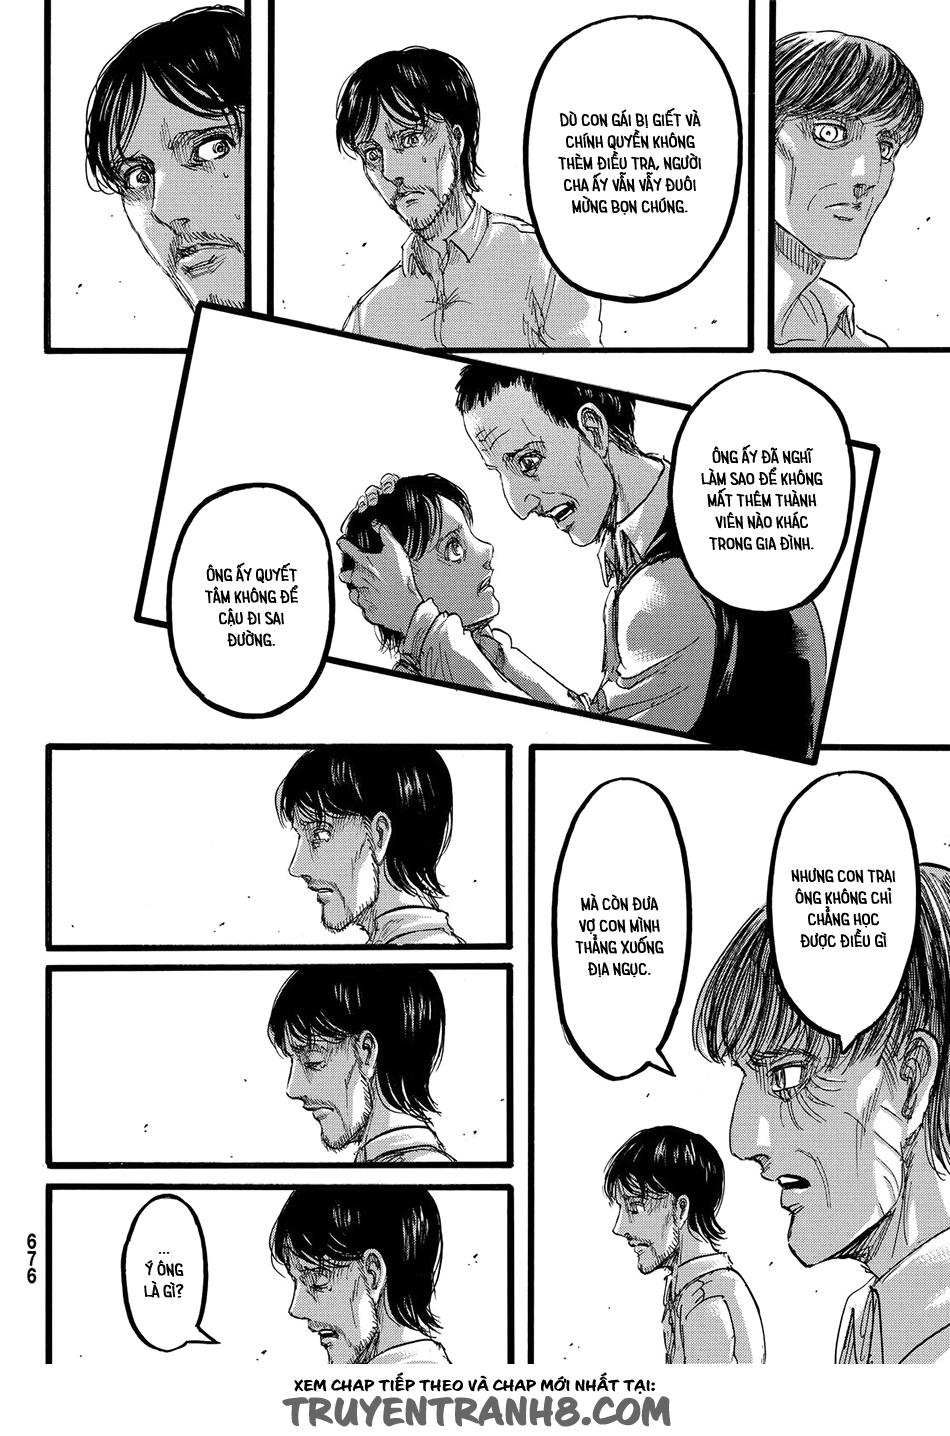 Shingeki no Kyojin - Attack on Titan Chap 88 page 34 Congtruyen24h